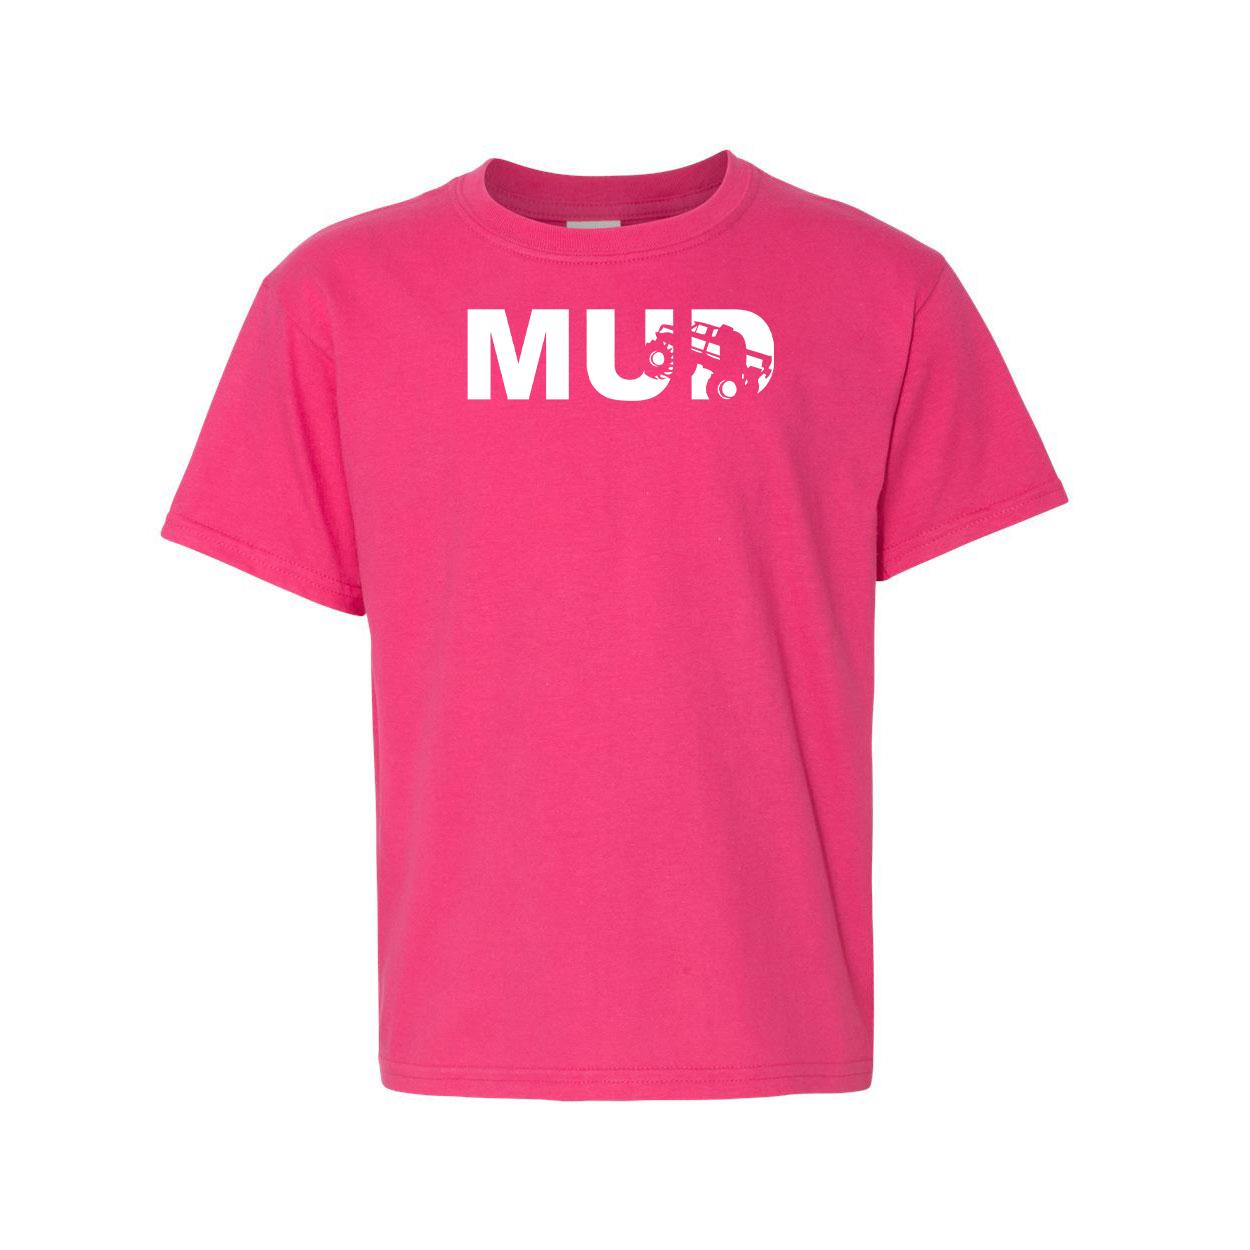 Mud Truck Logo Night Out Youth T-Shirt Pink (White Logo)